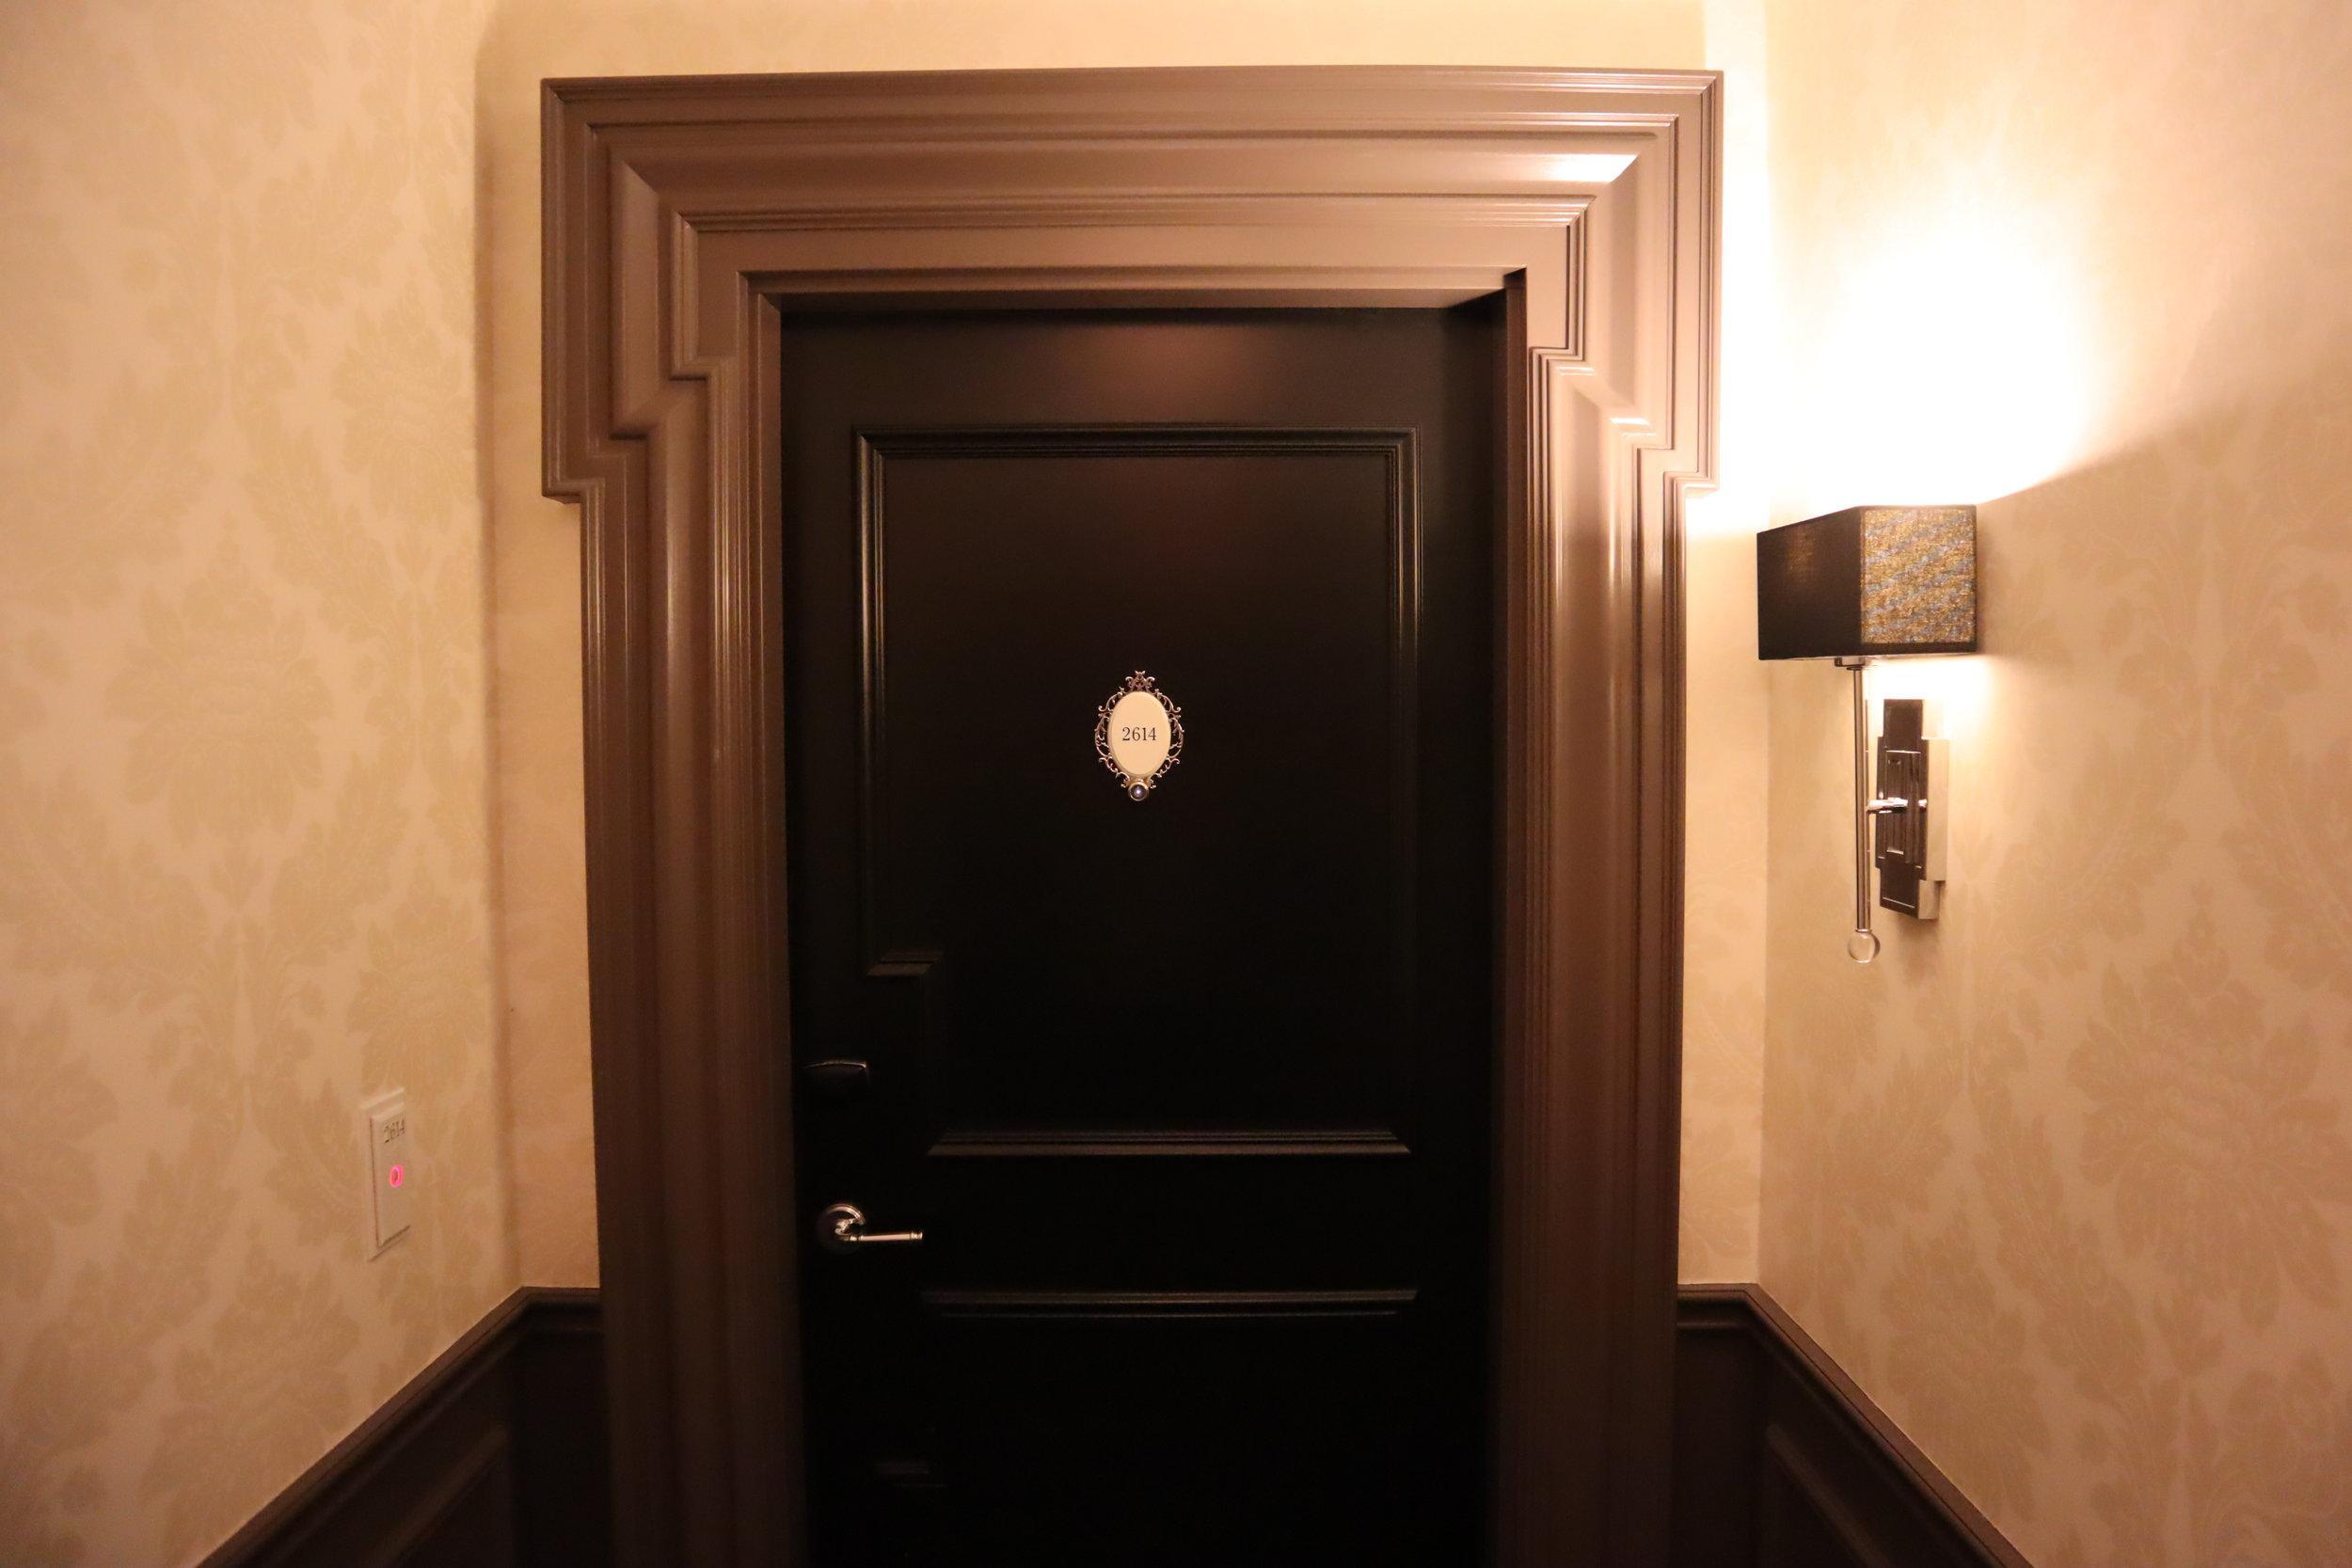 St. Regis Toronto – Room 2614